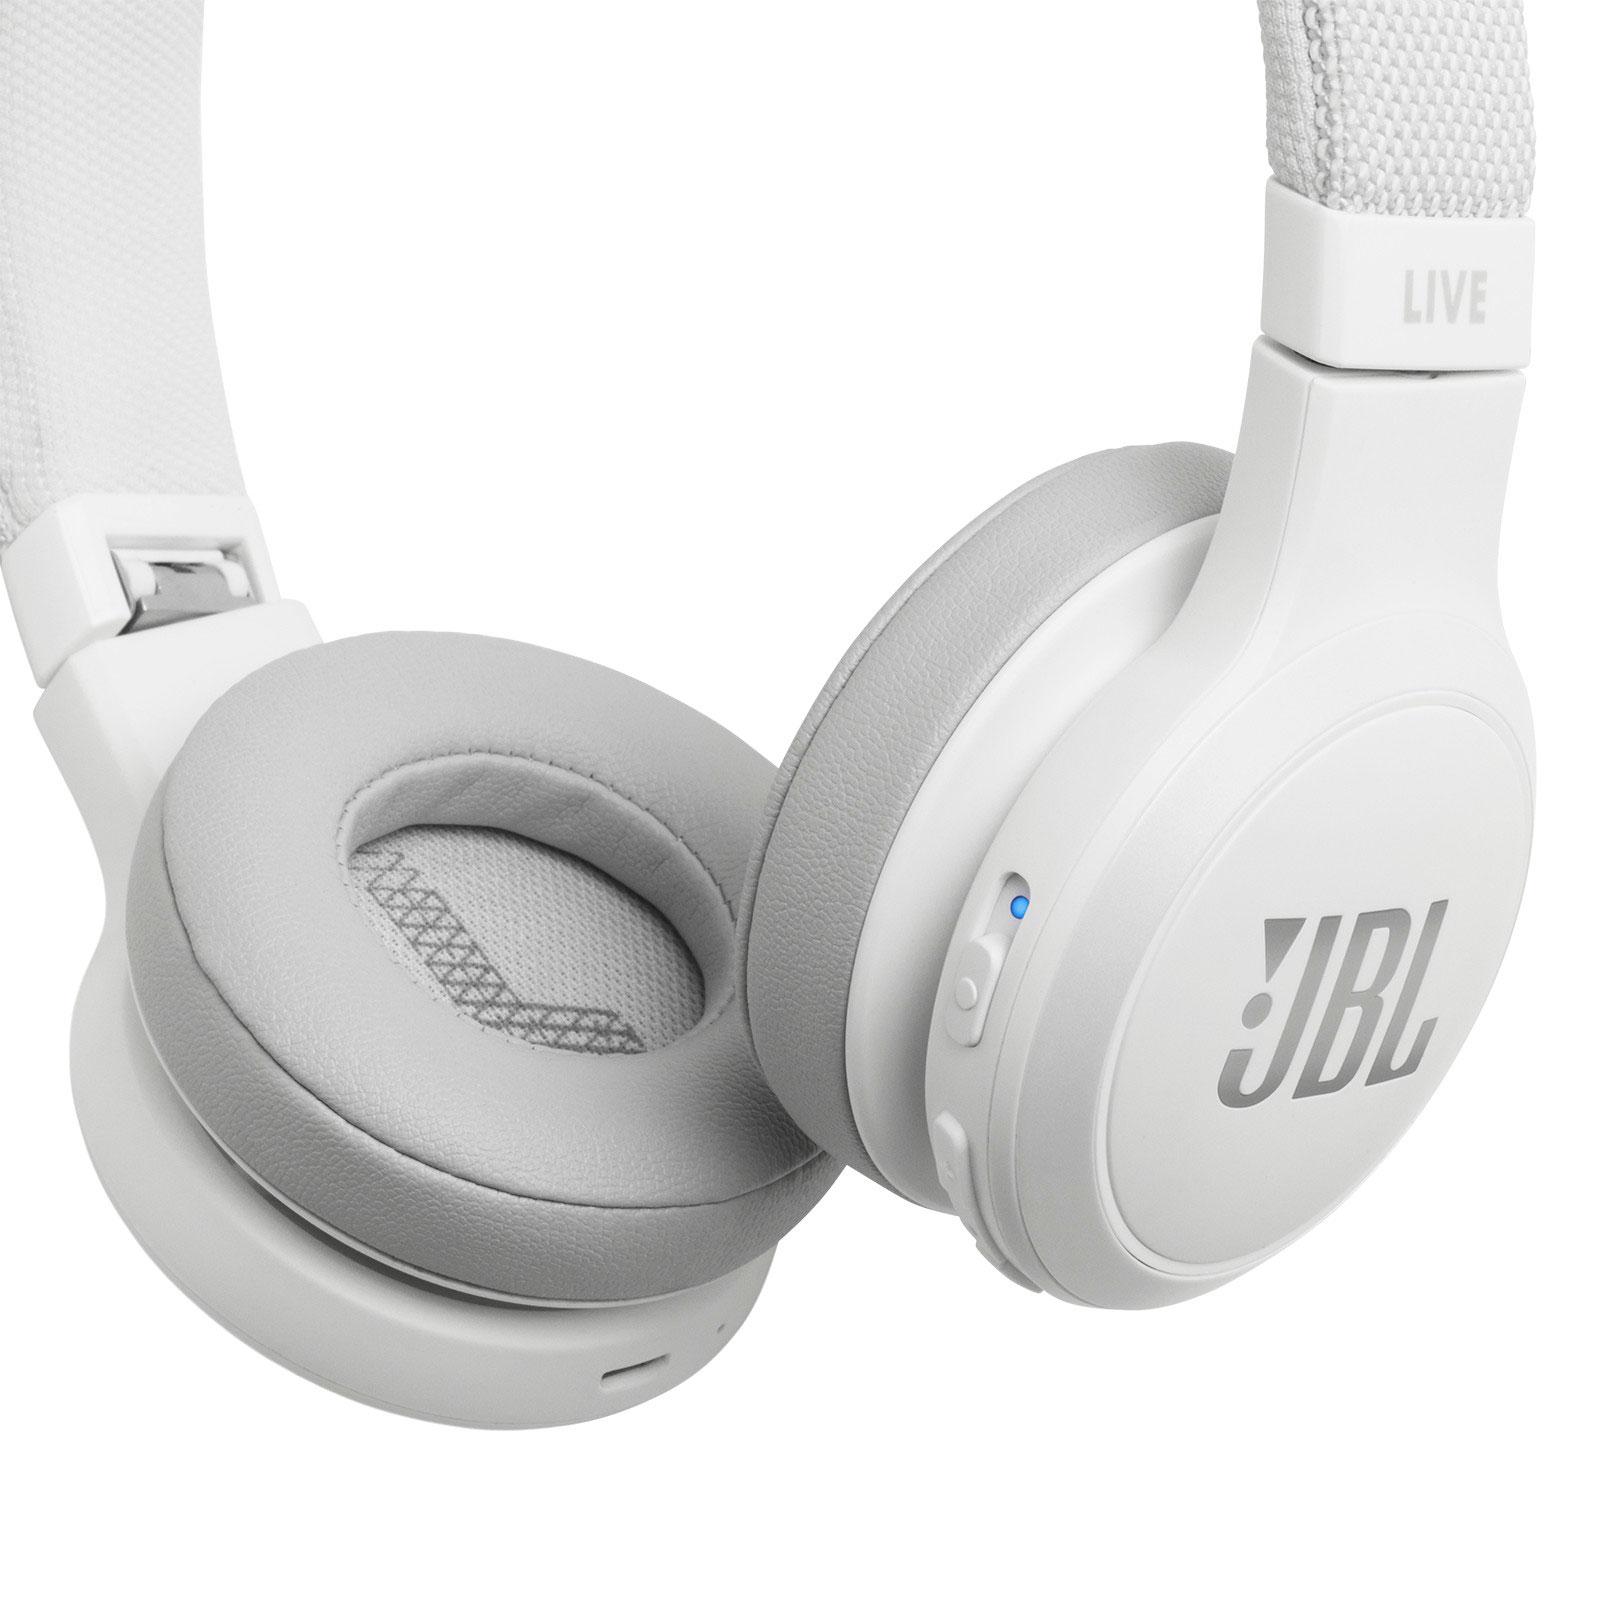 JBL представила новые модели наушников: LIVE100, LIVE200BT, LIVE400BT, LIVE500BT, LIVE650BTNC